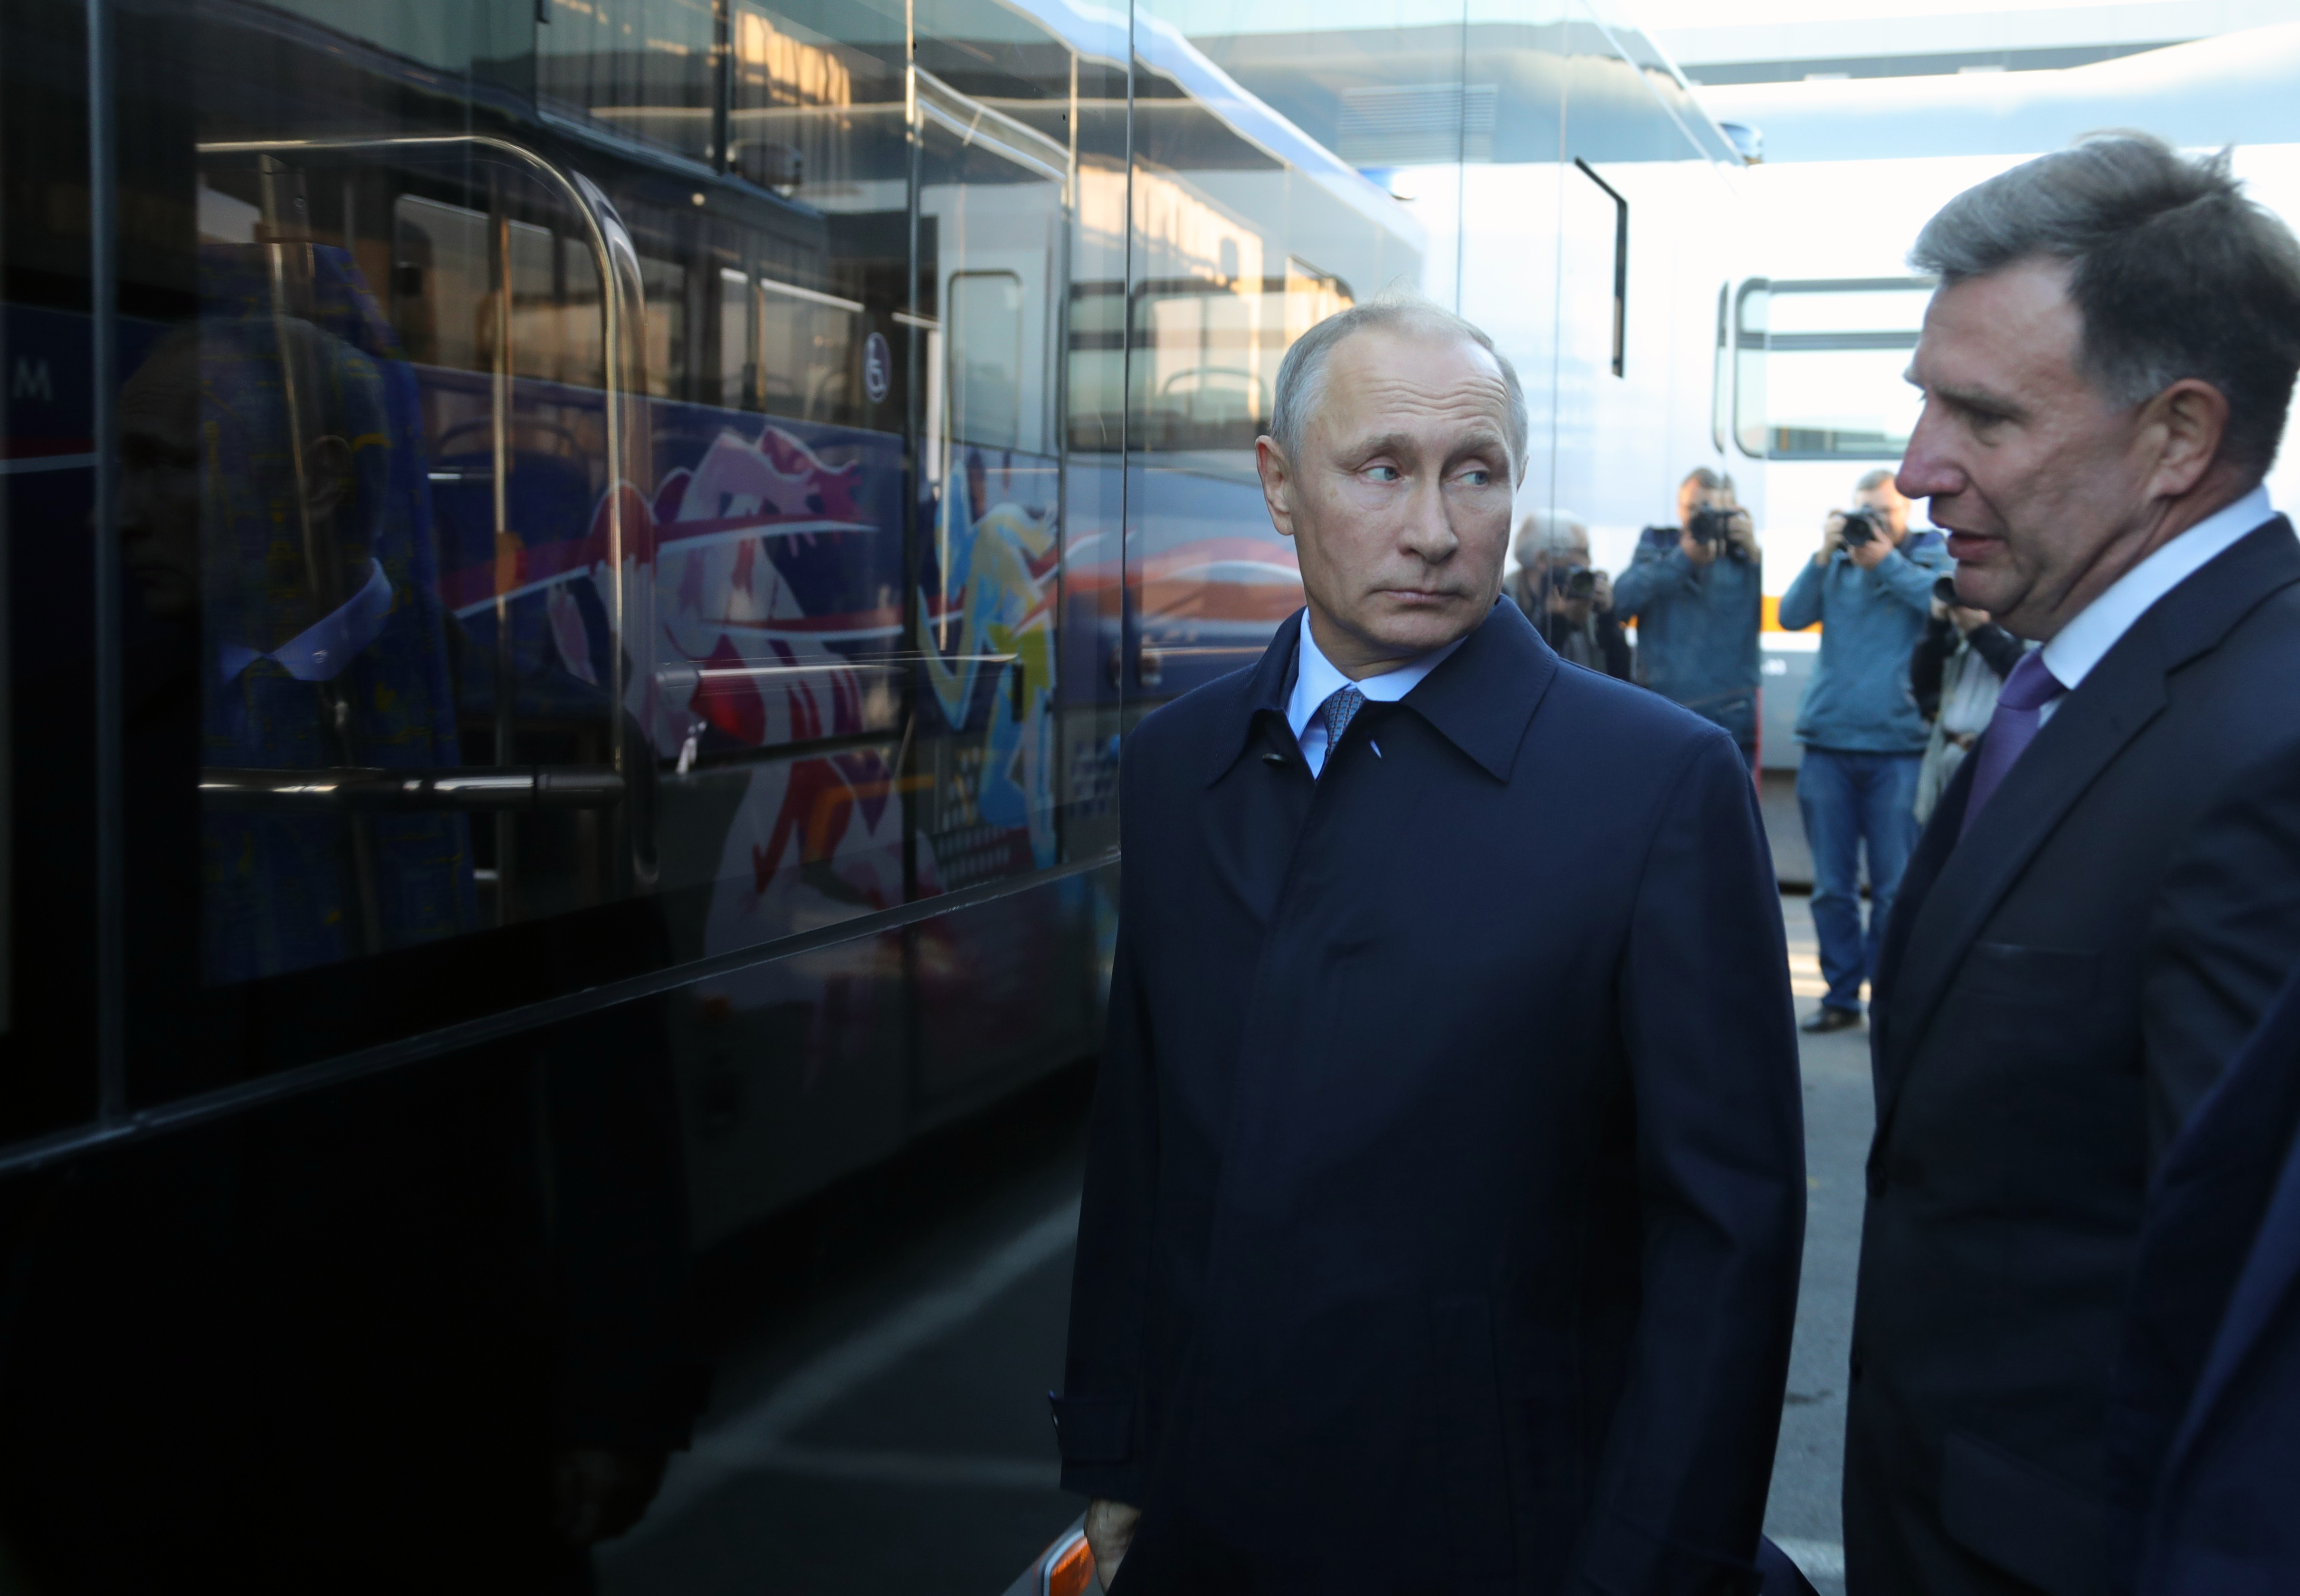 <p><span>Президент РФ Владимир Путин. Фото &copy; РИА Новости/Михаил Климентьев</span></p>